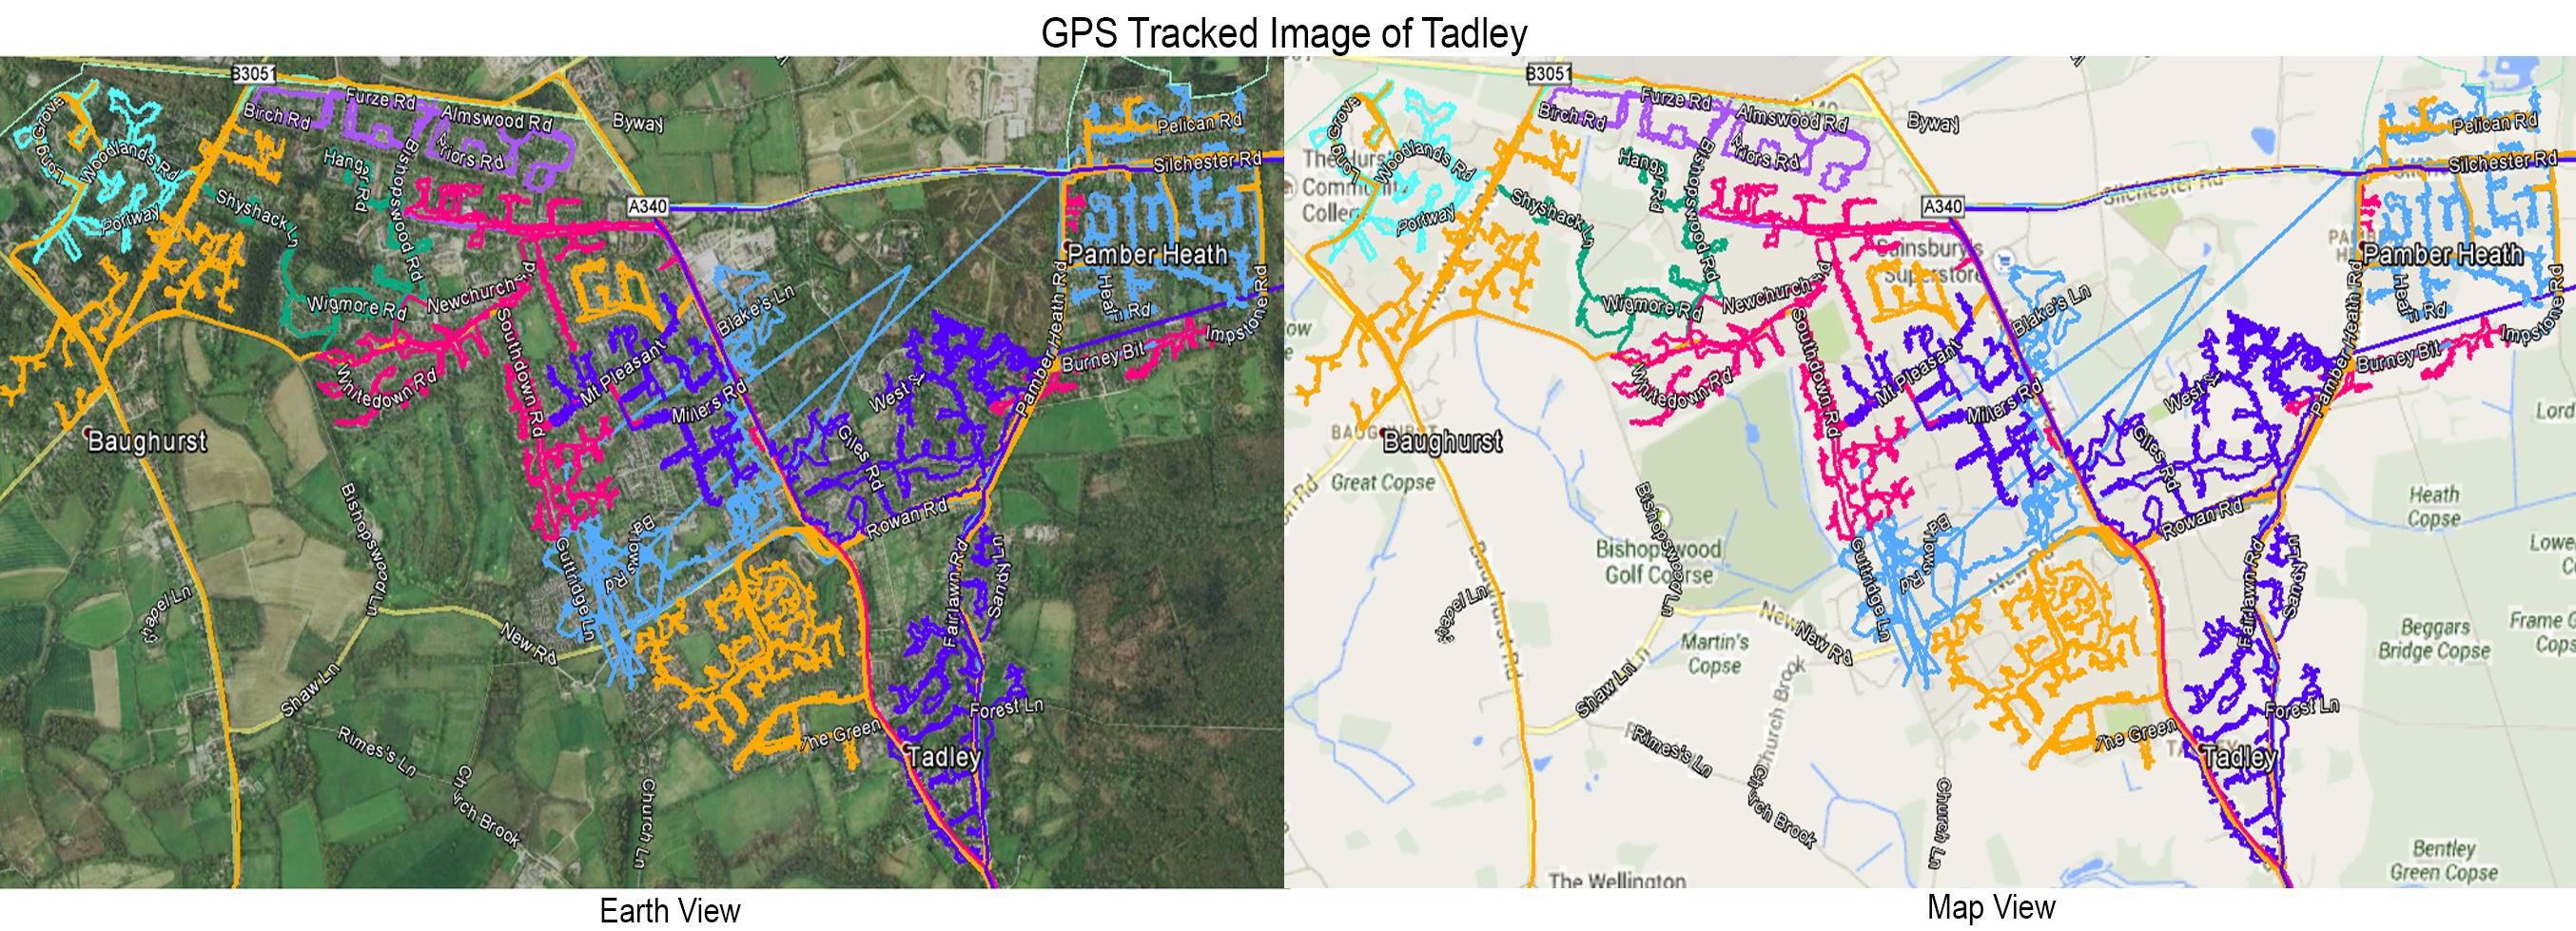 Leaflet Distribution Tadley - GPS Tracked